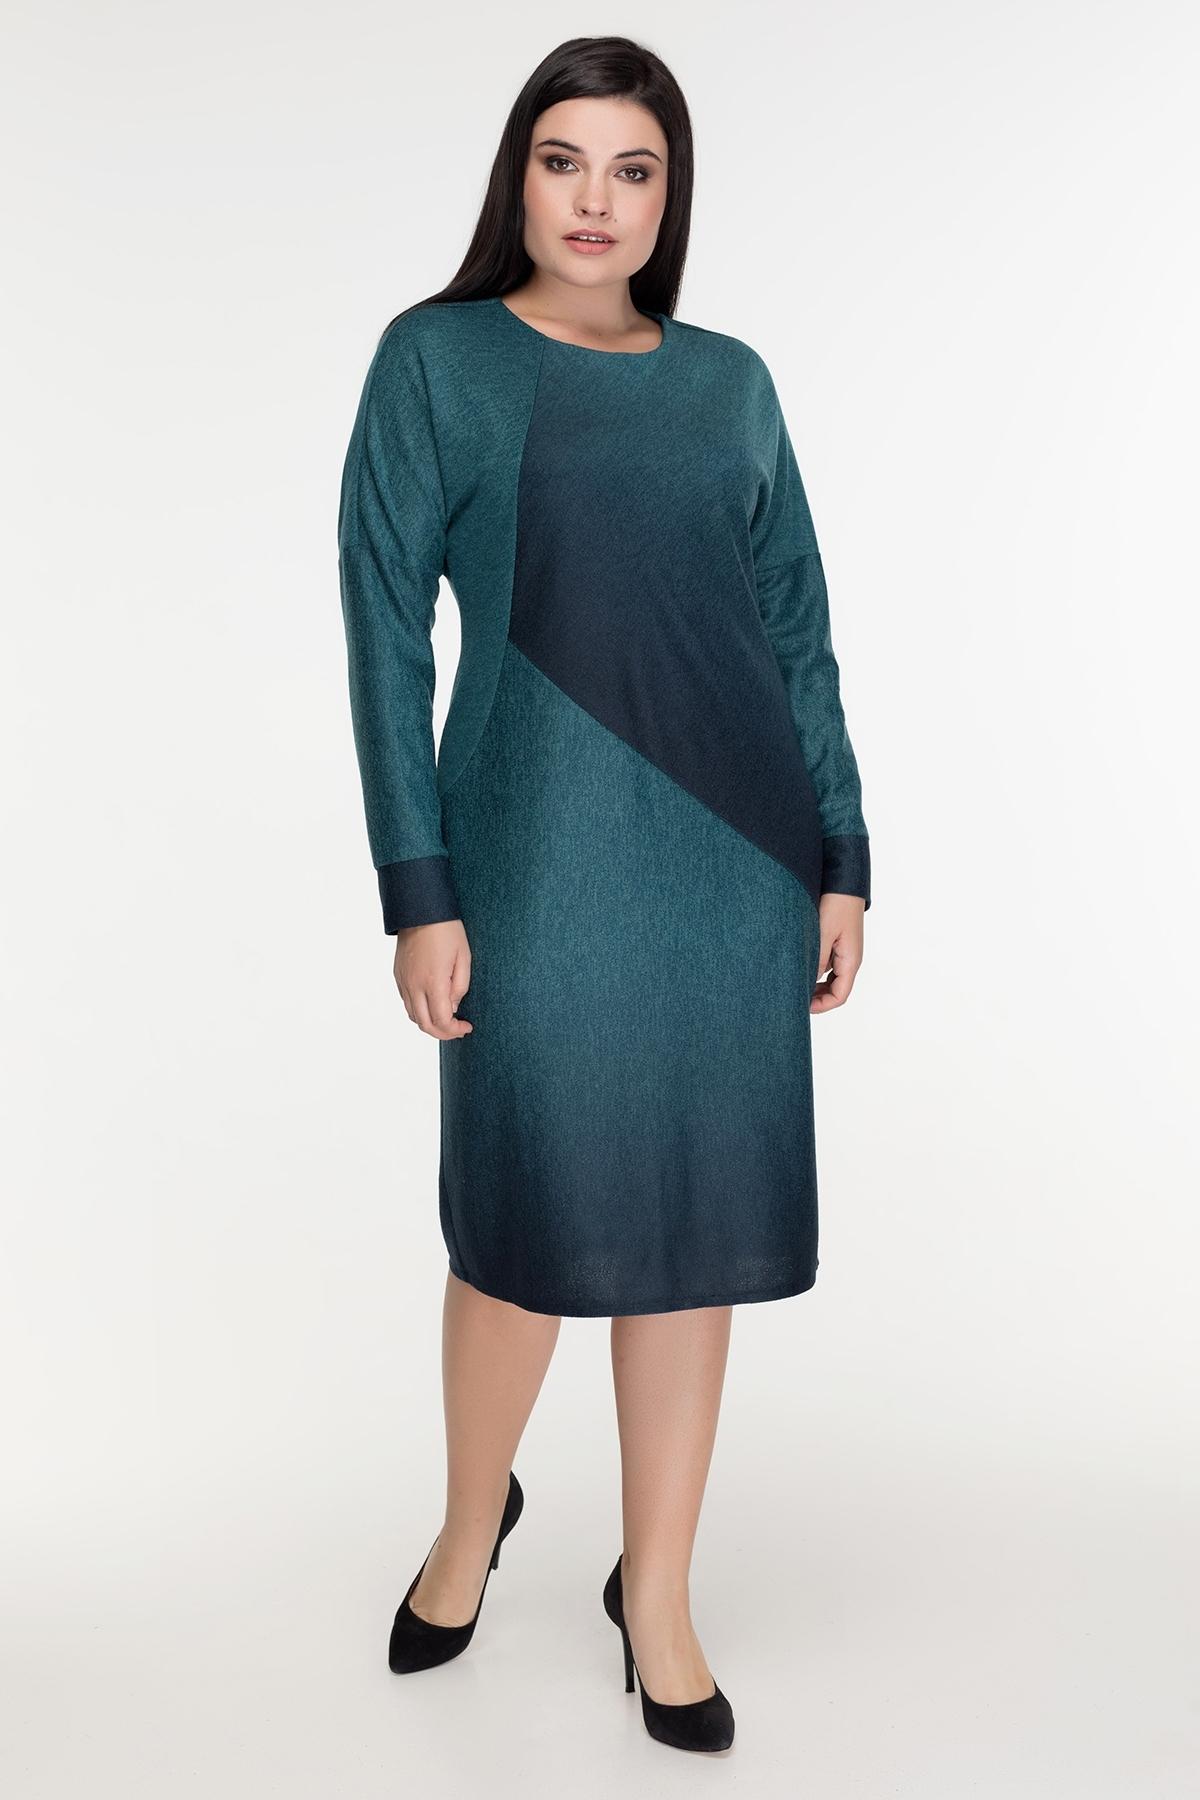 Платье Арабелла (зелёный)